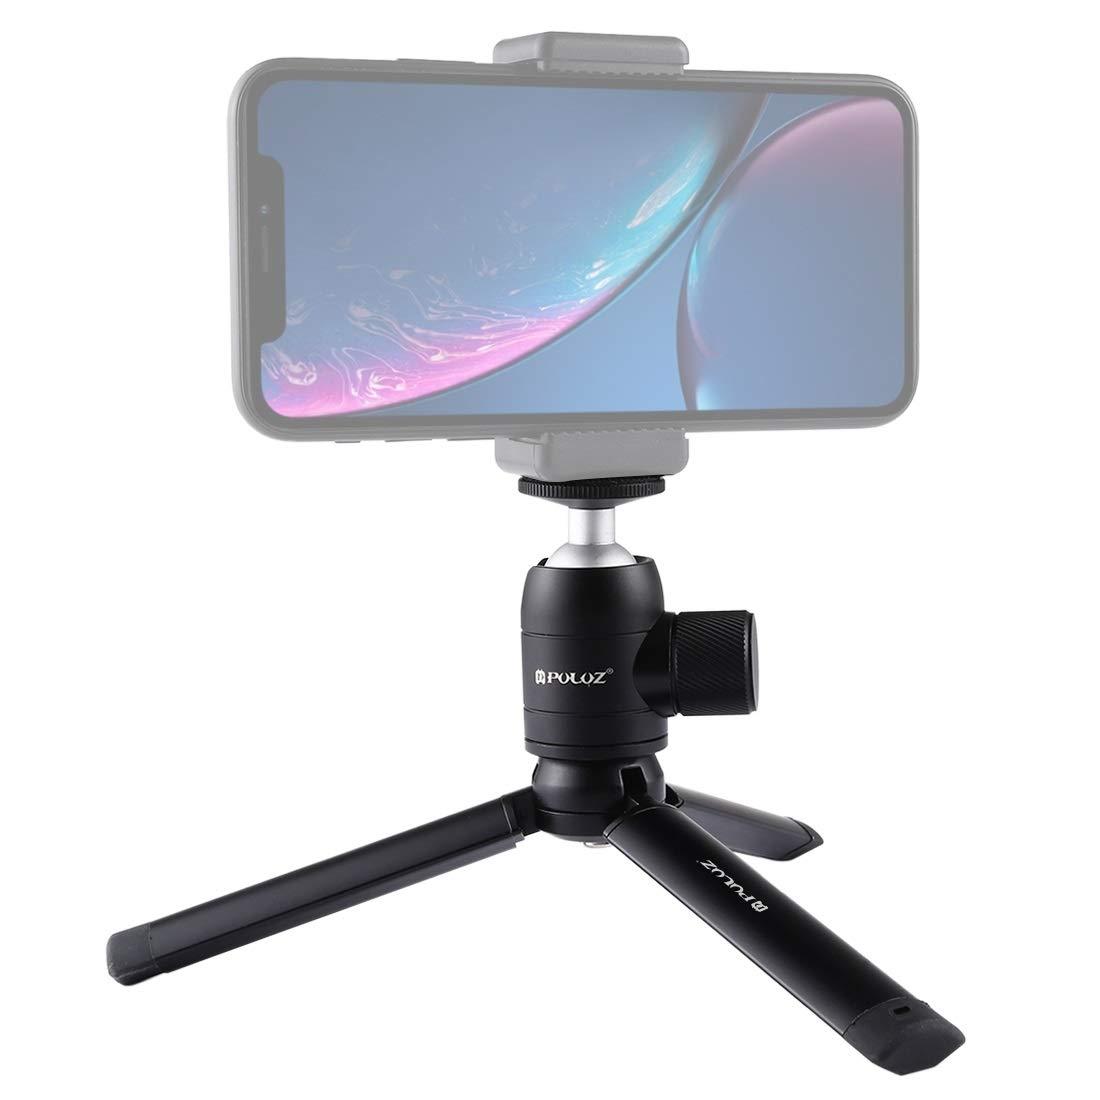 Camera Accessories Mini Pocket Metal Desktop Tripod Mount Mini Metal Ball Head with 1//4 inch Screw for DSLR /& Digital Cameras